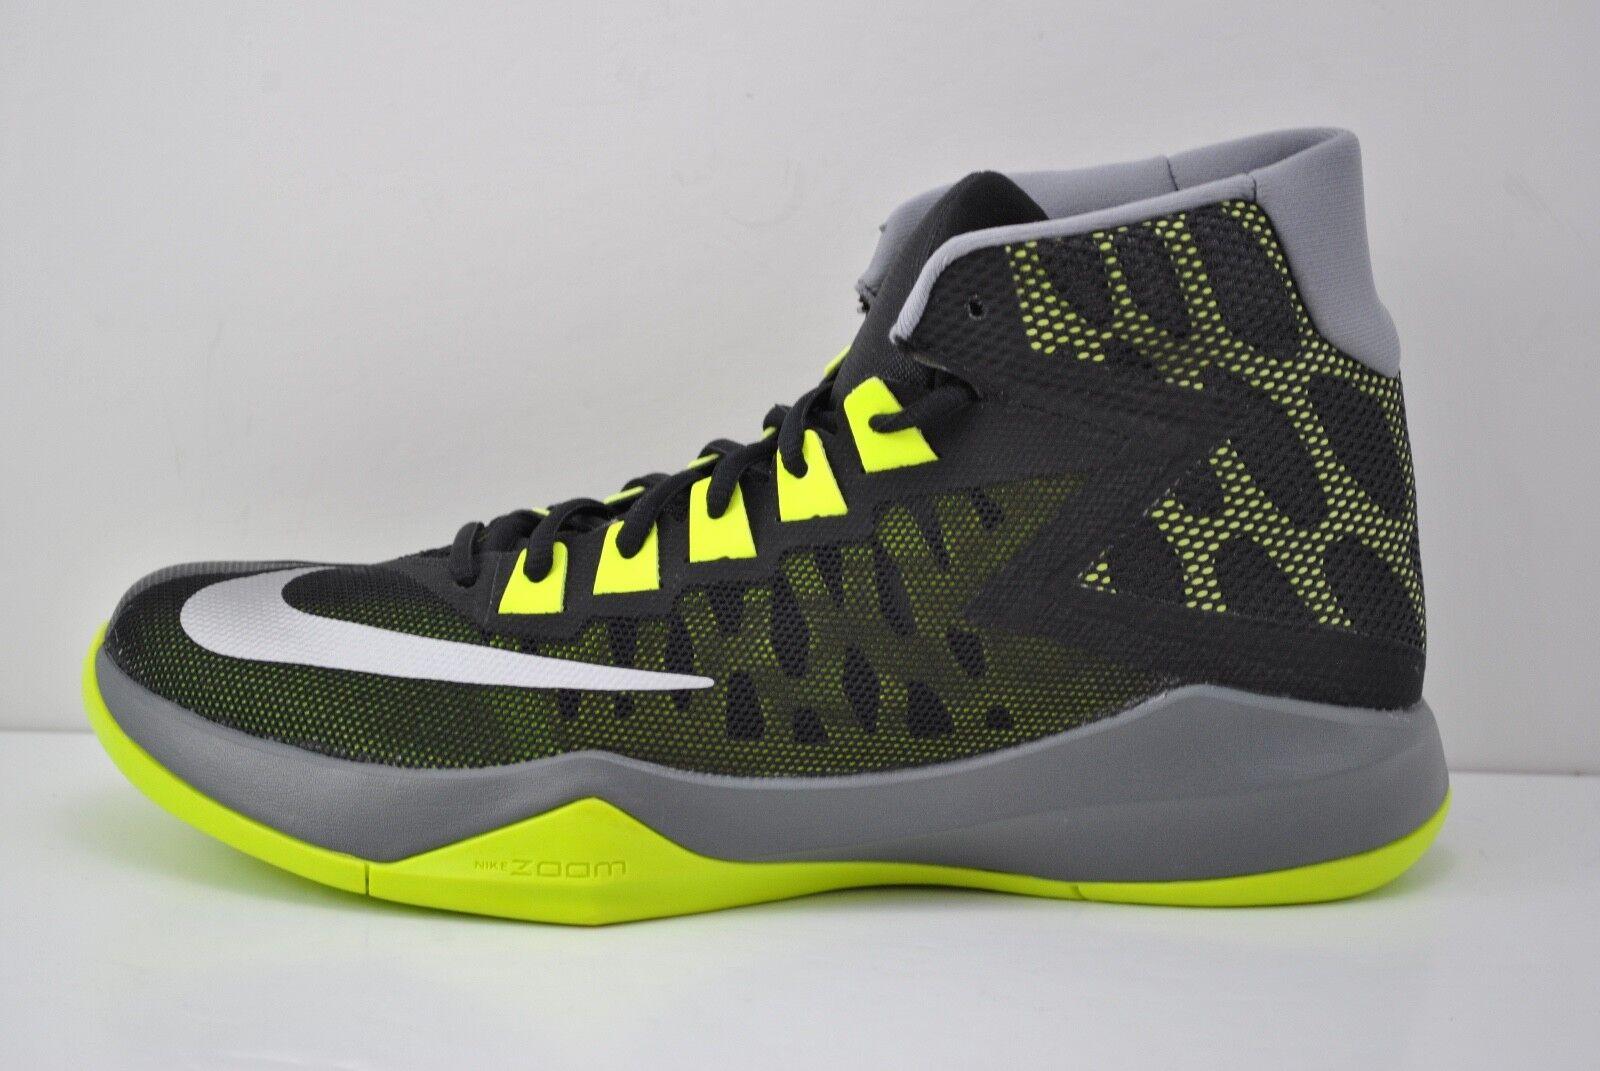 Hombre zapatos Zoom de baloncesto de Nike Zoom zapatos devosion comoda marca de descuento 7a0a14